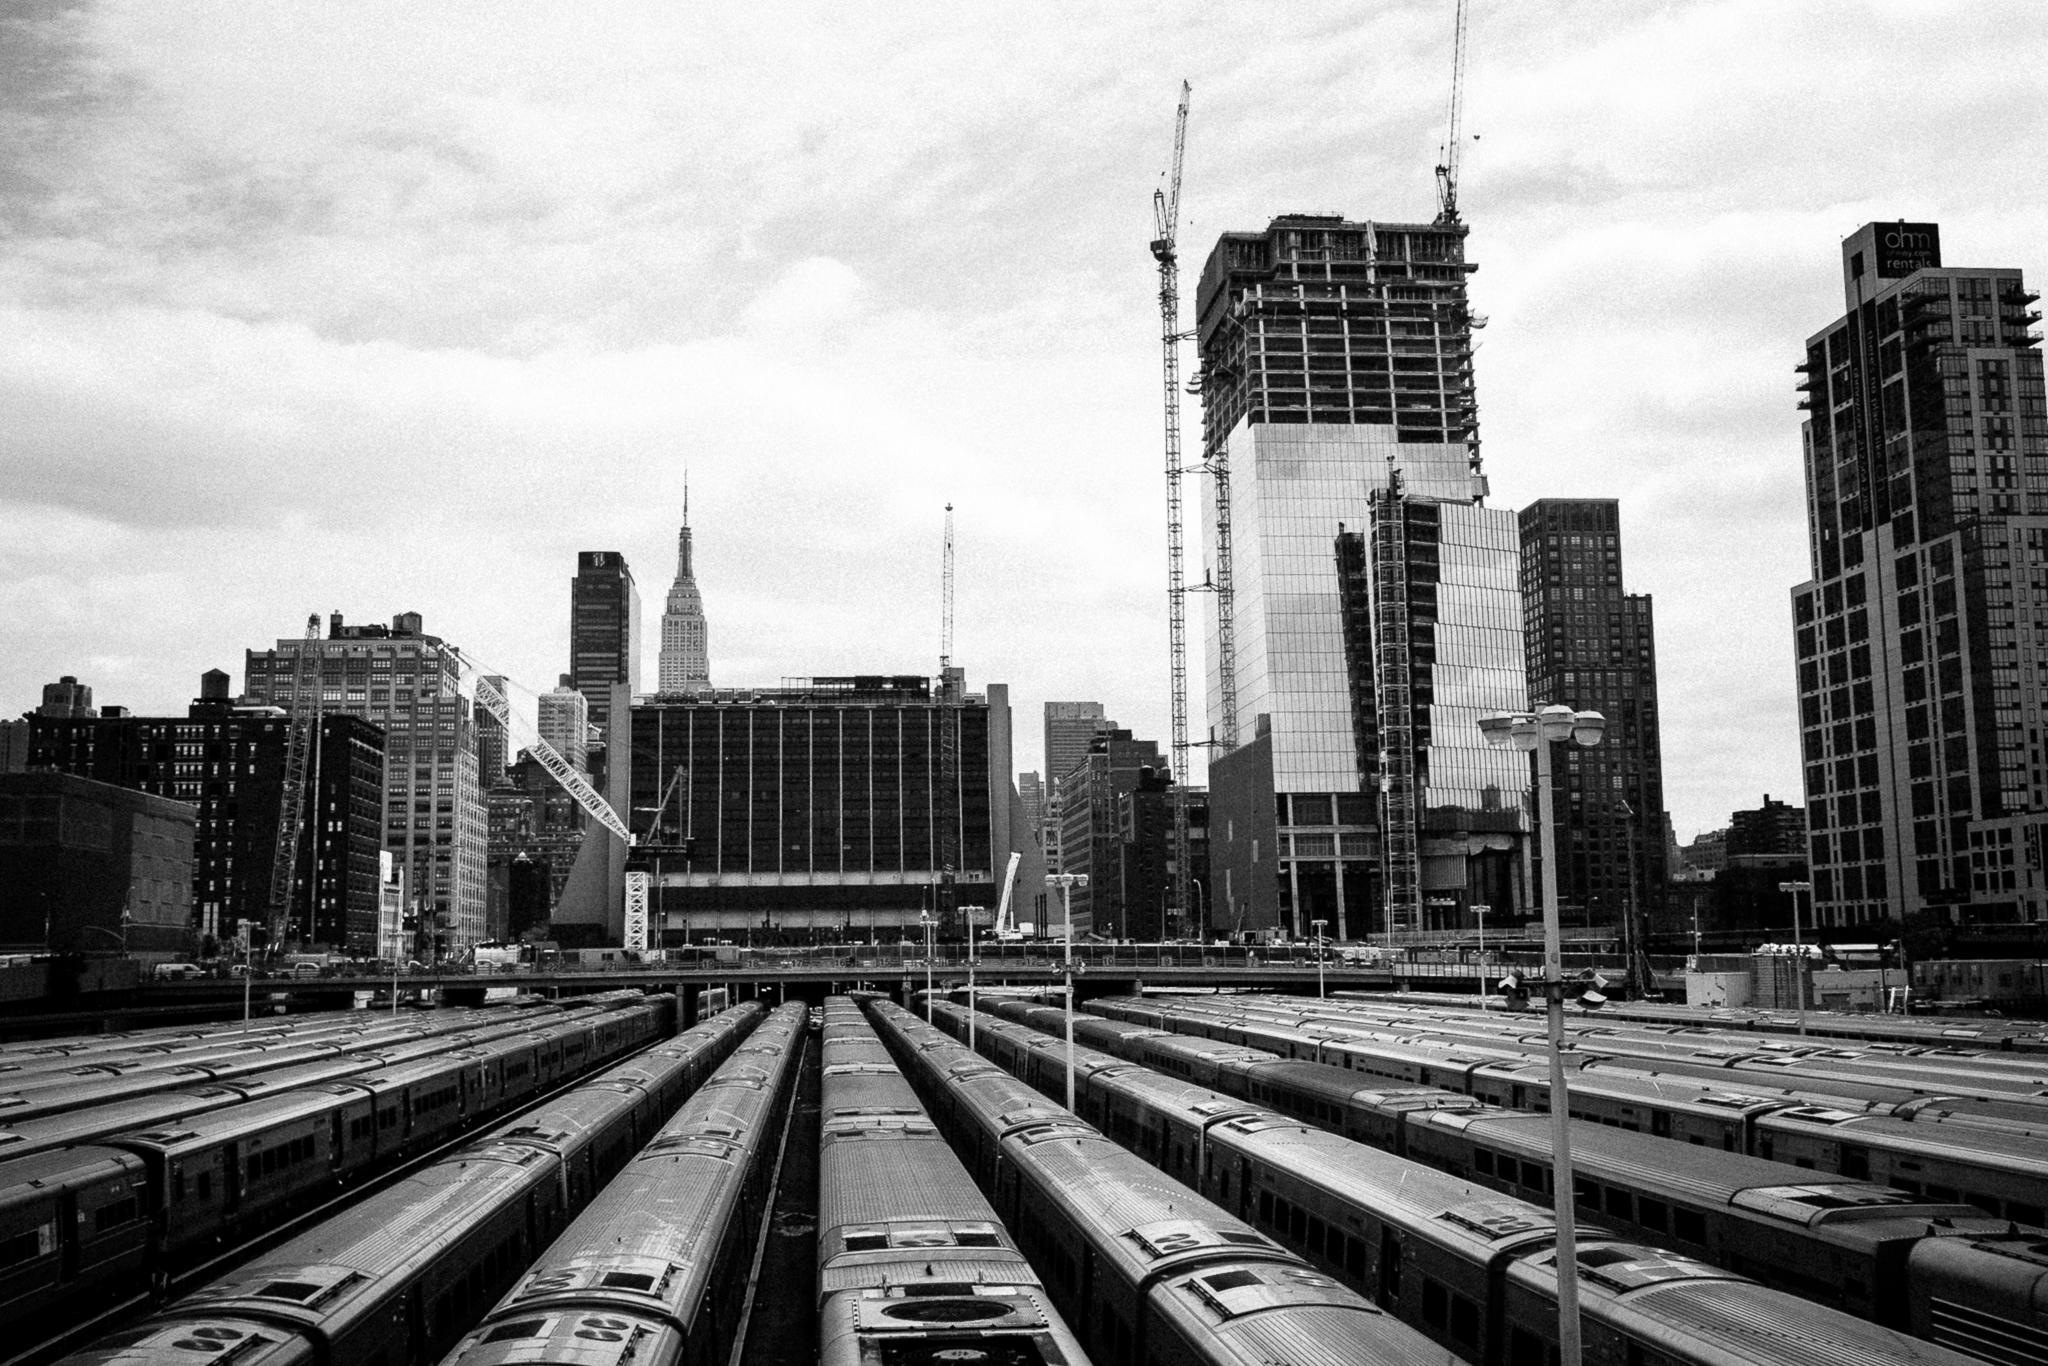 2015-05-14-NYC-2169.jpg